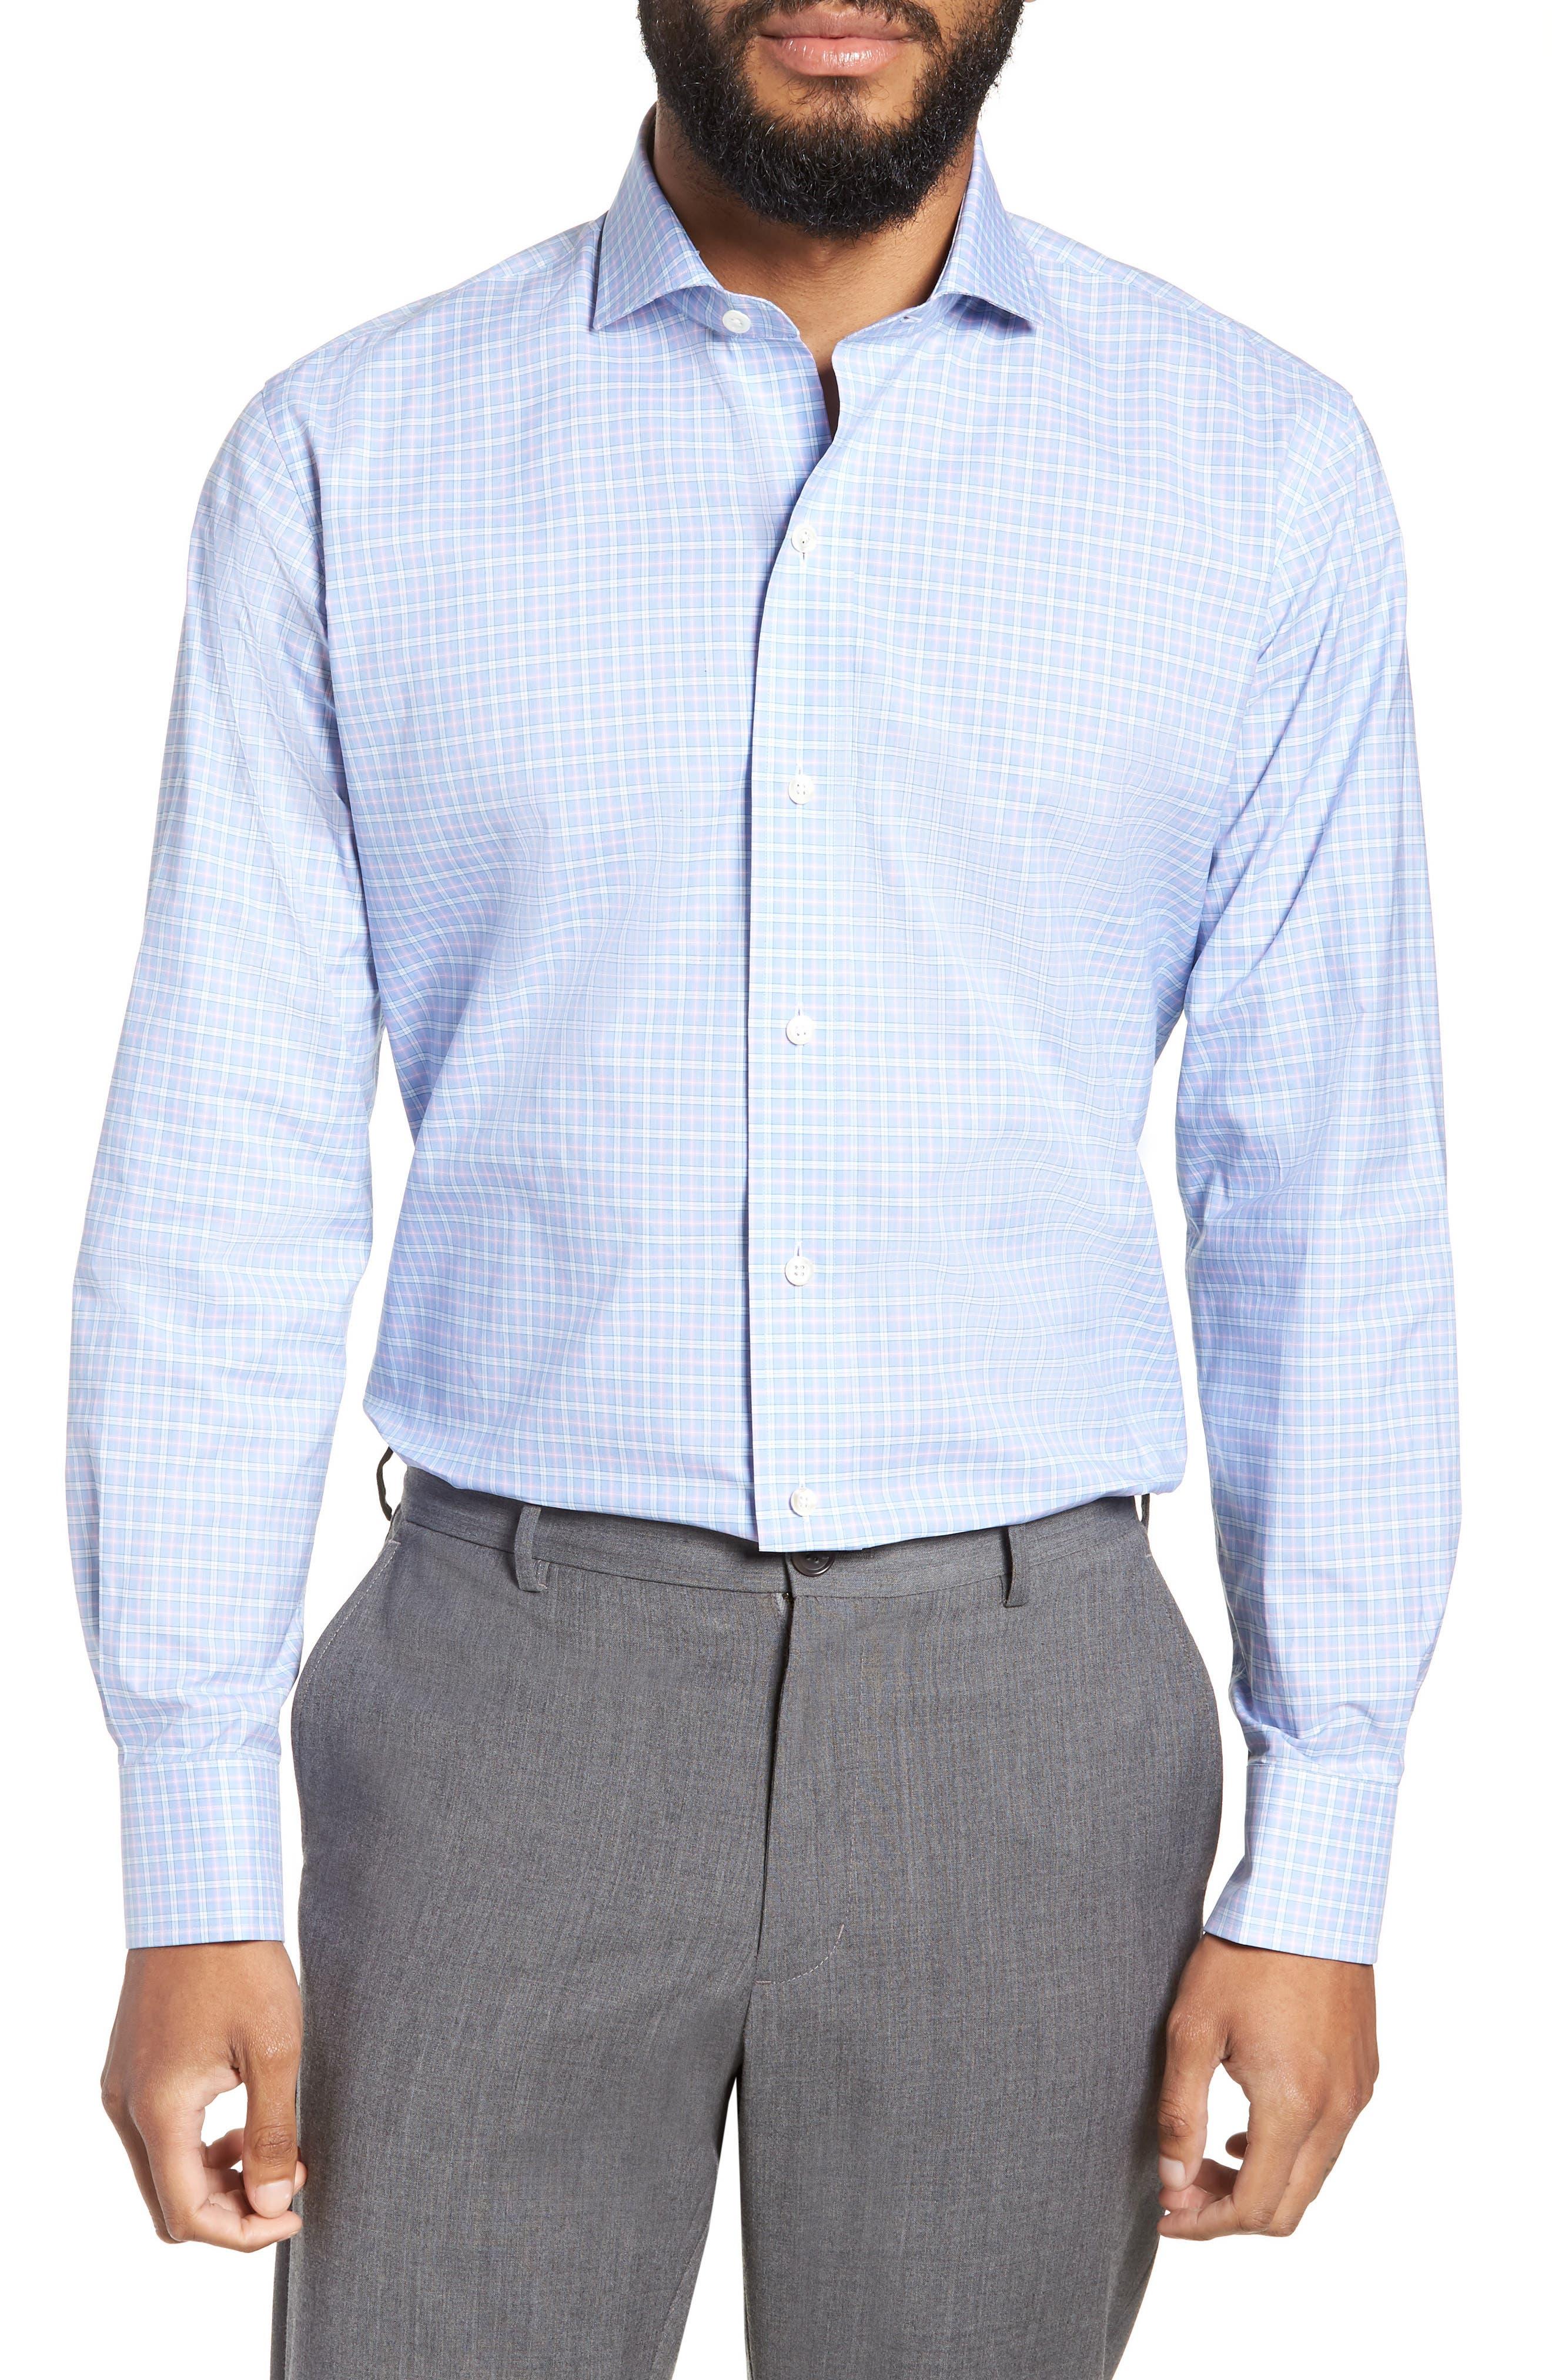 Ferris Slim Fit Check Dress Shirt,                             Main thumbnail 1, color,                             LIGHT/ PASTEL BLUE